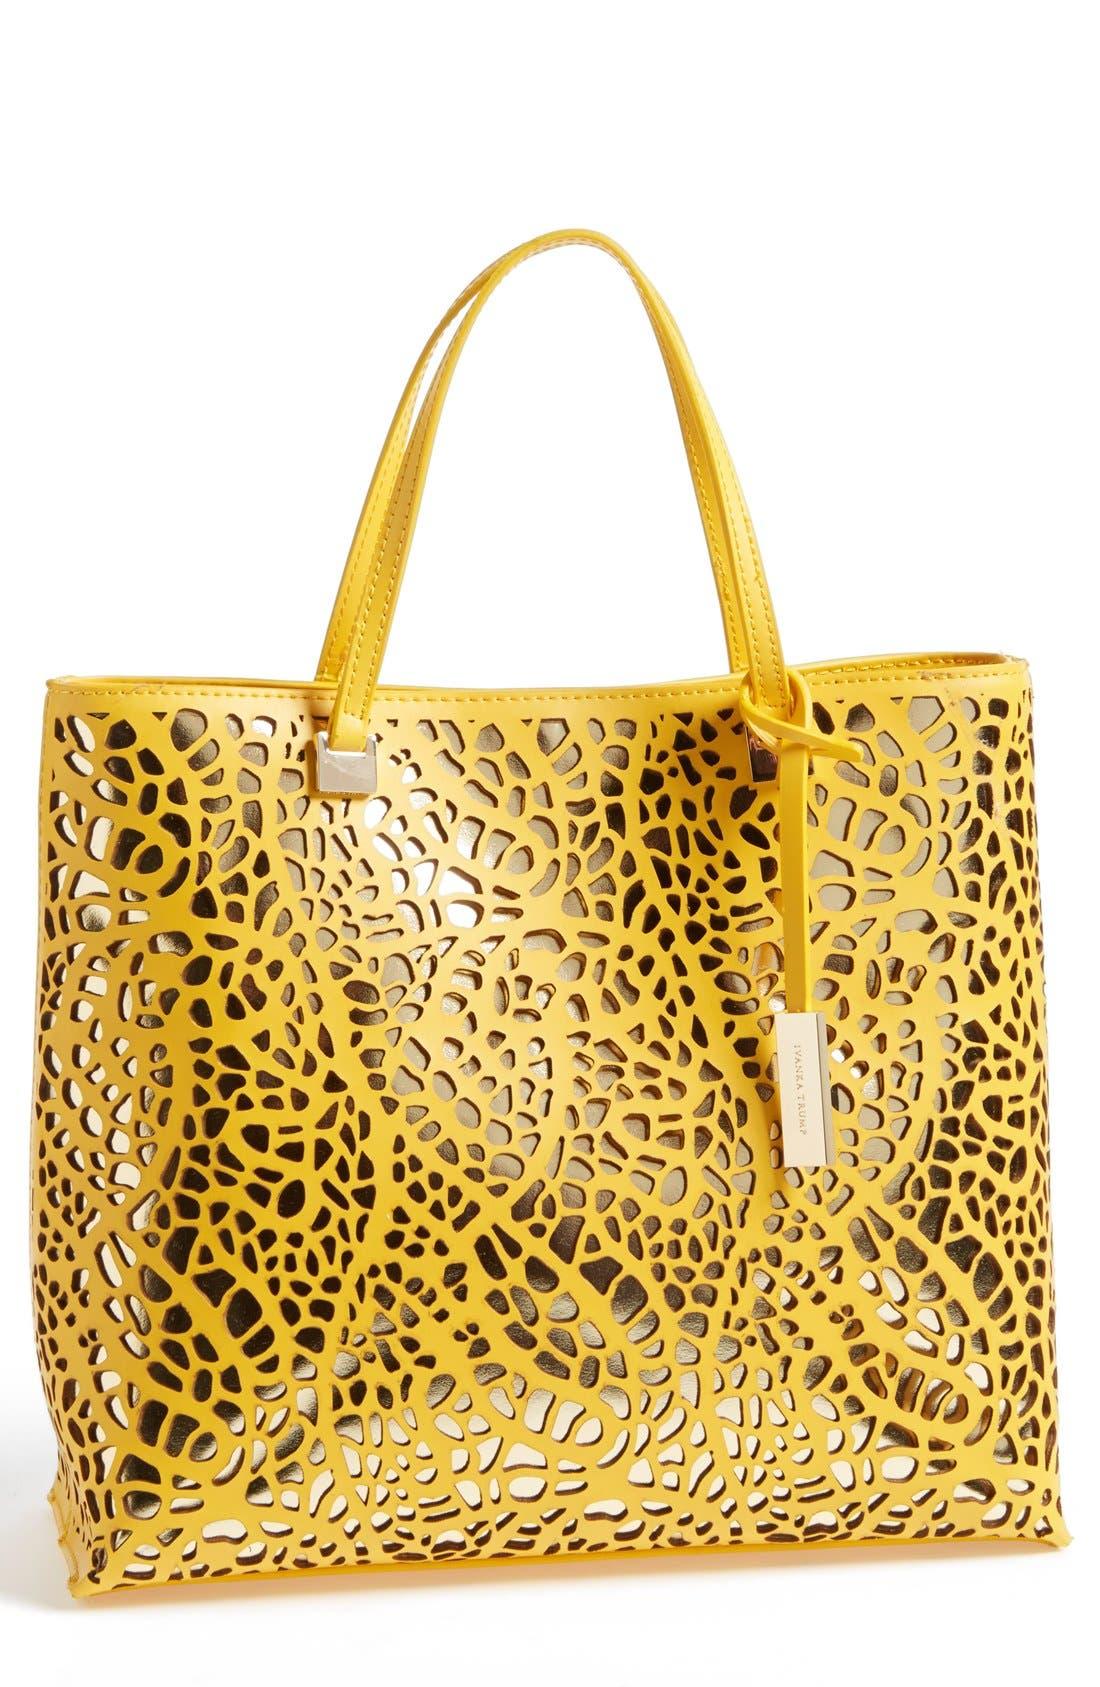 Alternate Image 1 Selected - Ivanka Trump 'Julia' Perforated Handbag